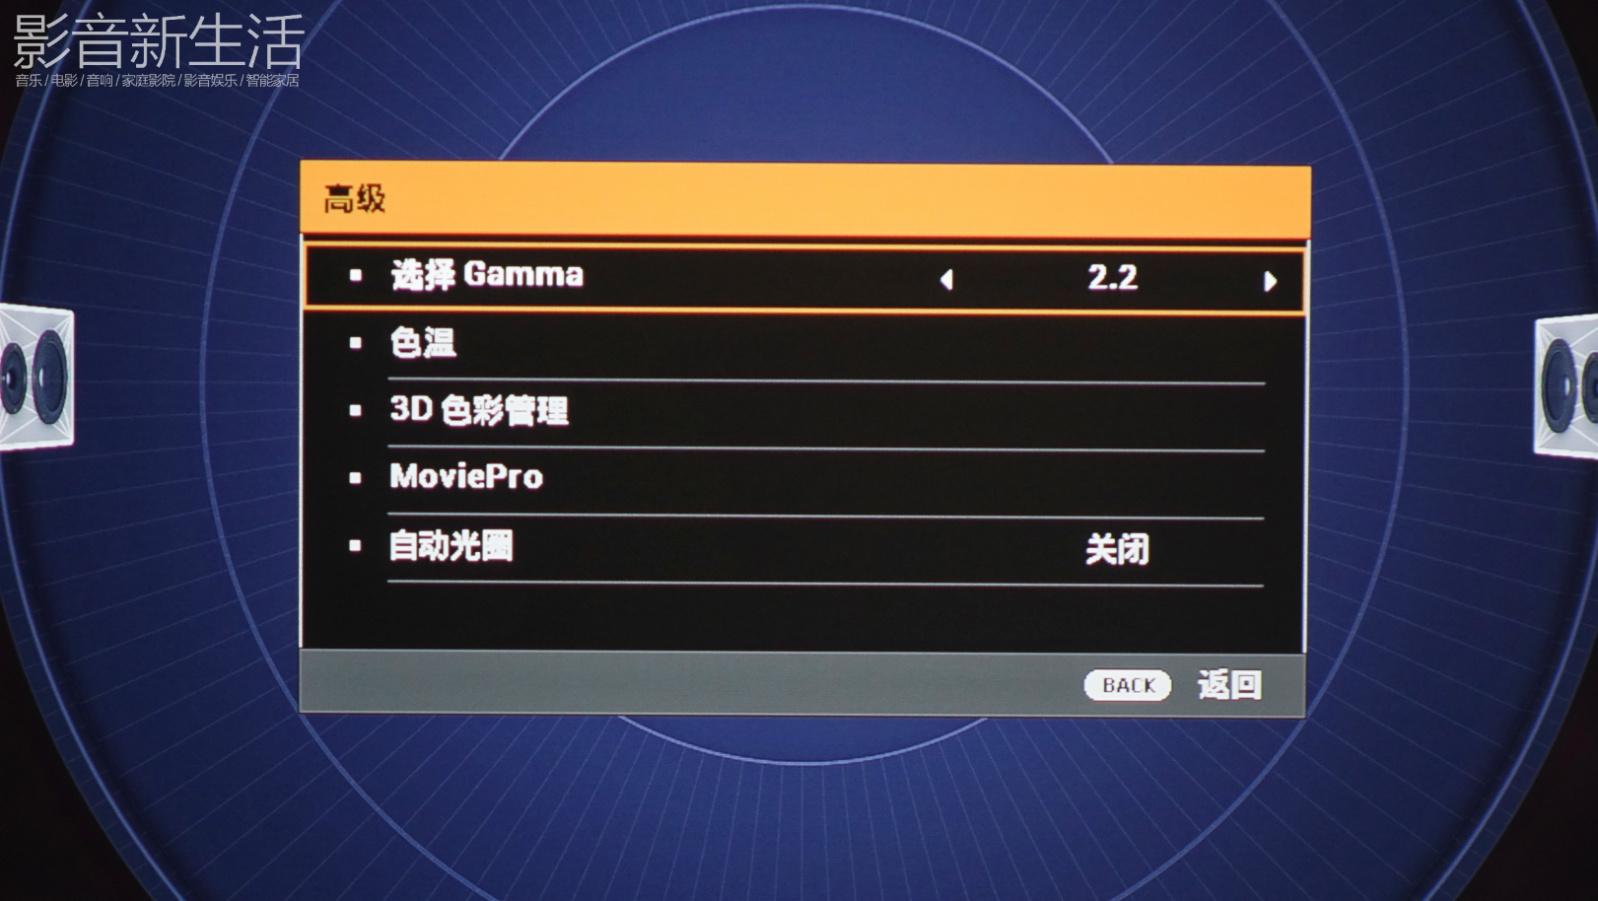 "JVC DLP UH1 Menu10 - 推荐 | ""无法抗拒的色彩诱惑,普及家用4K/UHD投影的新尝试!"" JVC DLP LX-UH1 投影机"